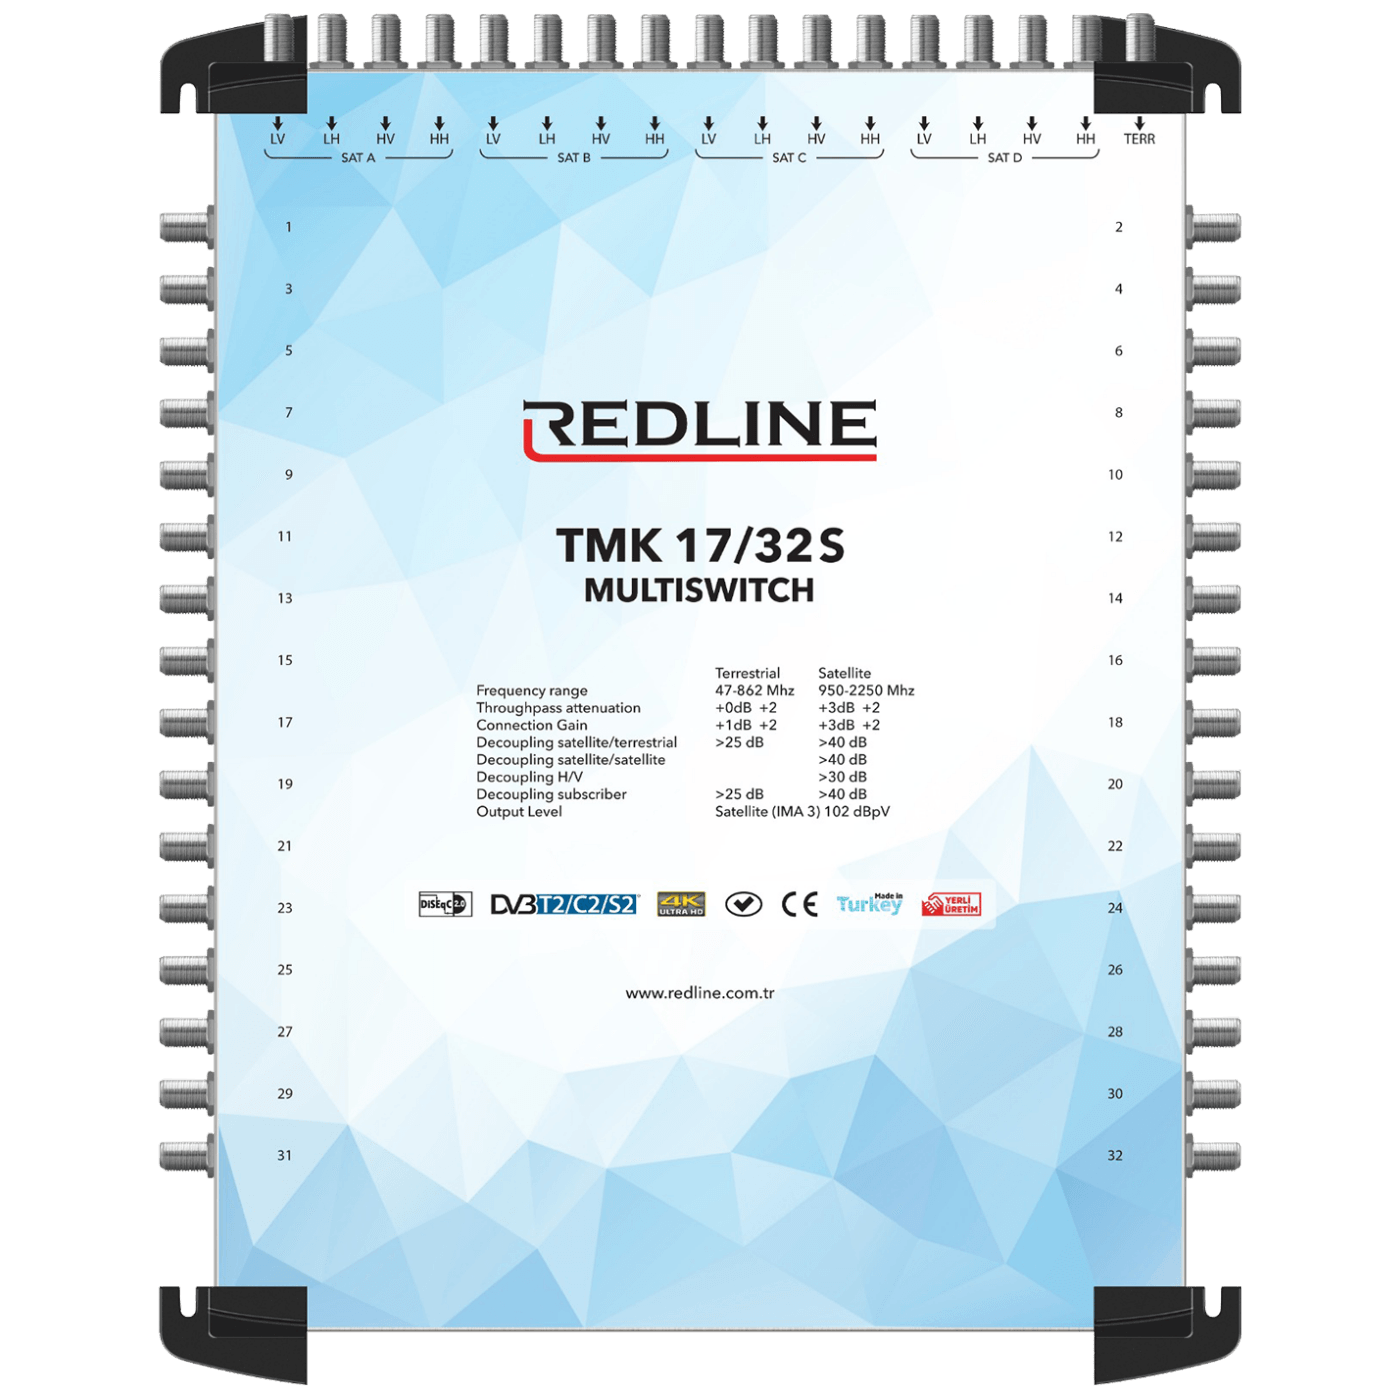 REDLINE - TMK 17/32S